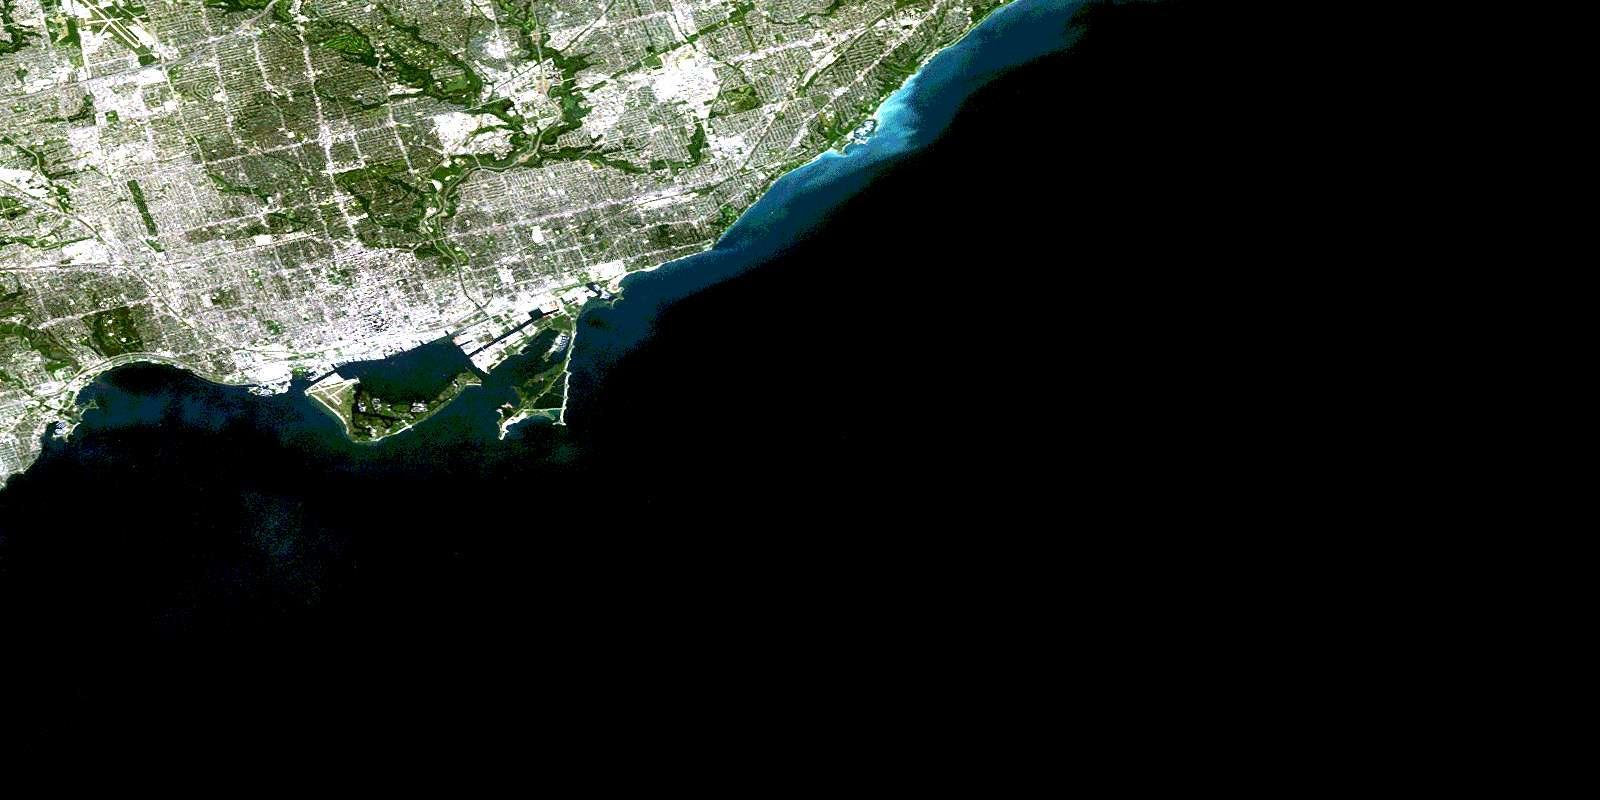 google műholdas térkép budapest Toronto műholdas térkép   Térkép Toronto műholdas (Kanada) google műholdas térkép budapest